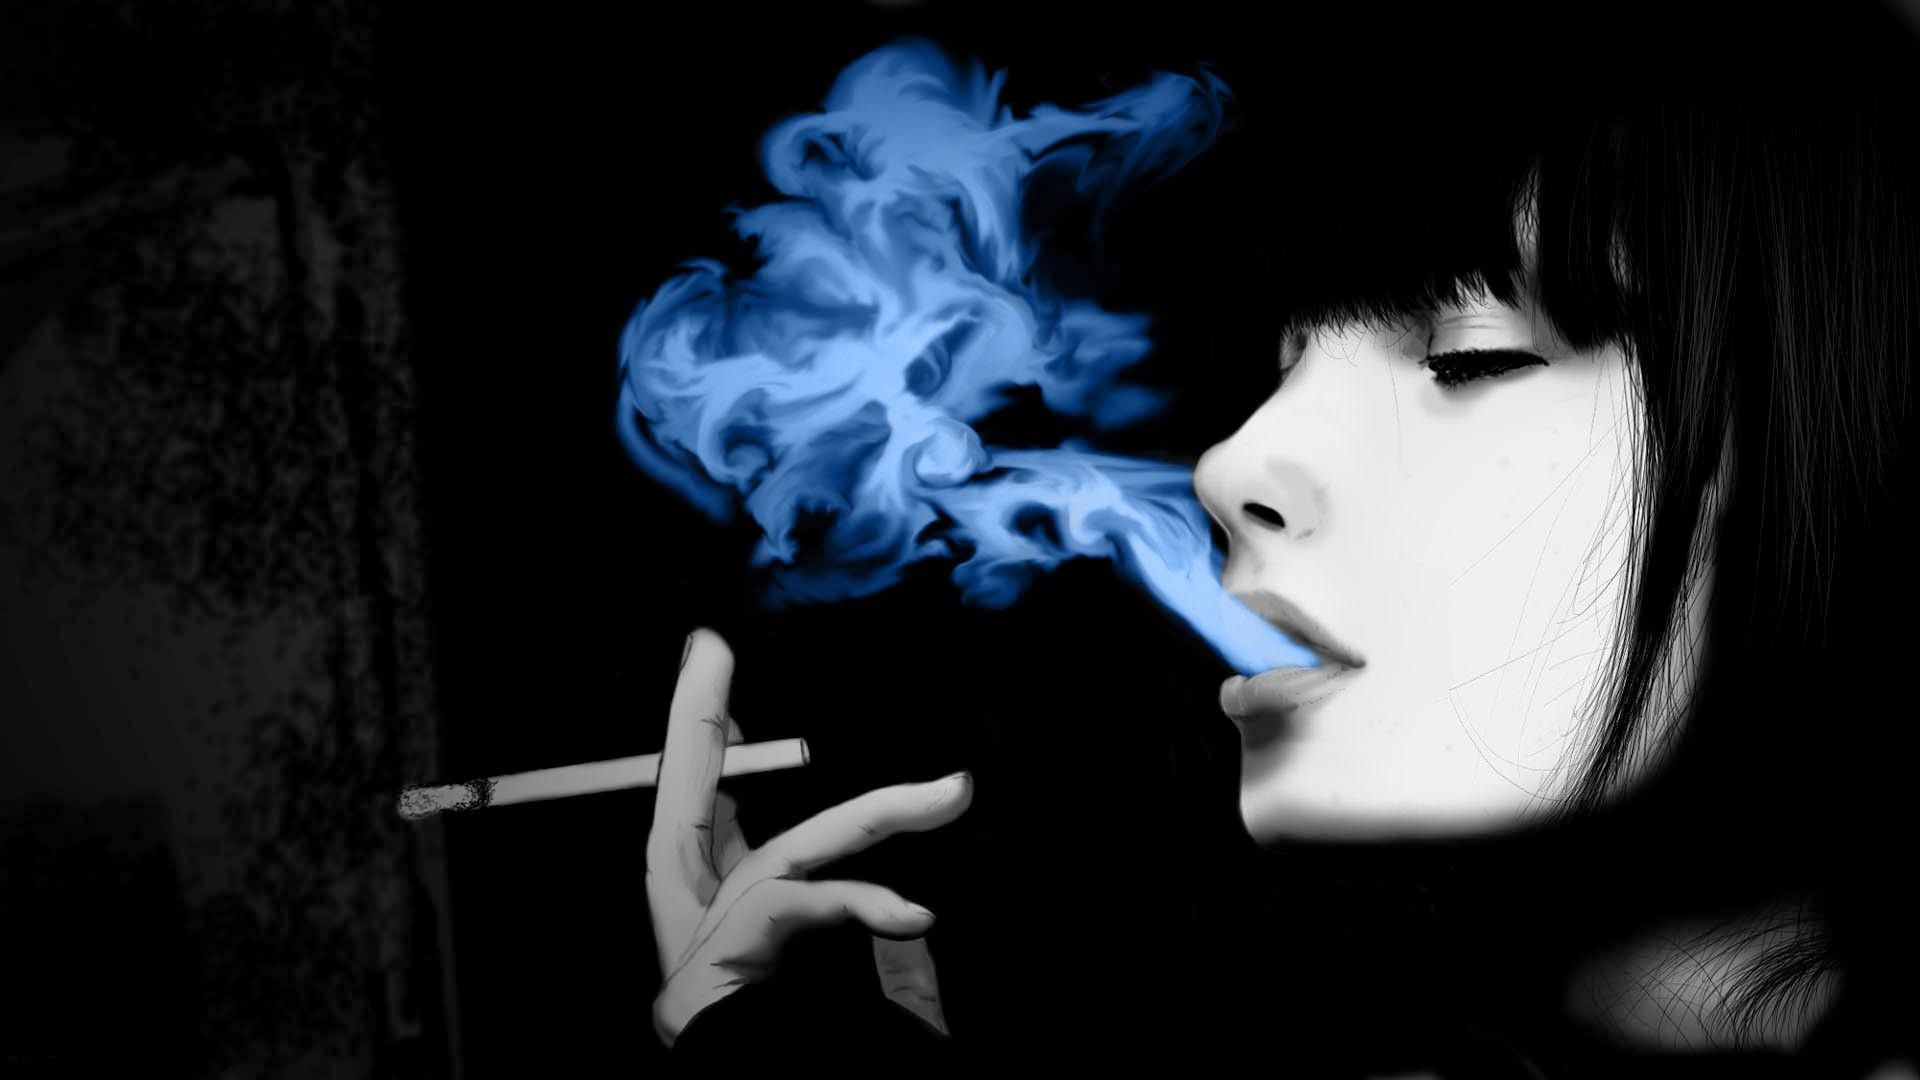 Girl Anime Wallpaper Free Download Hd Smoking Wallpapers Group 71